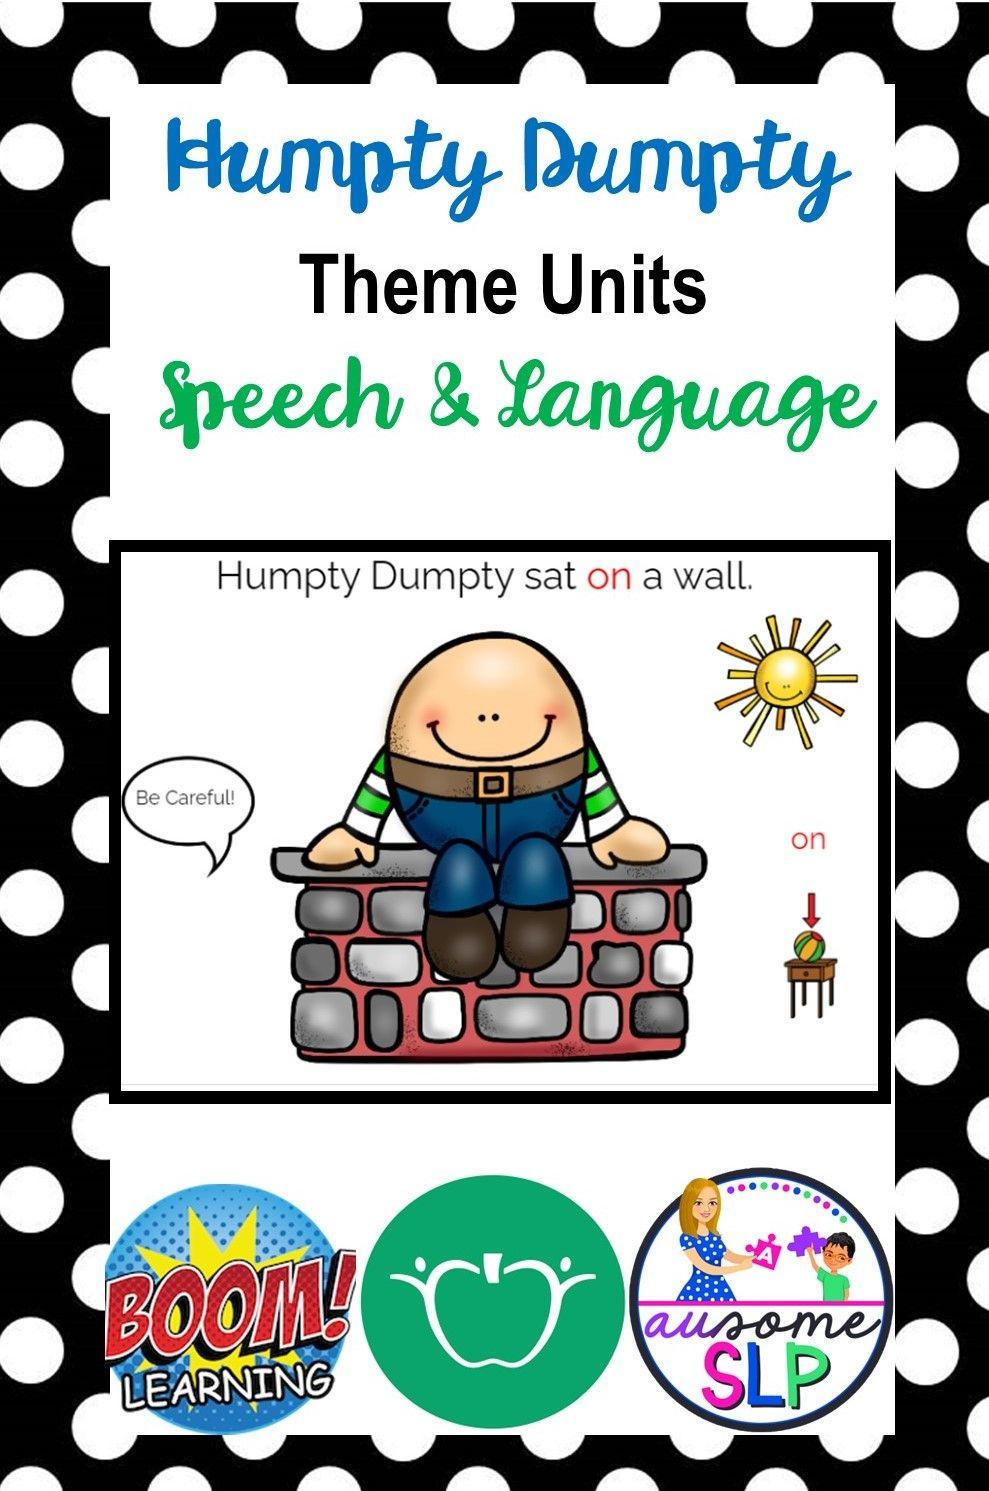 Nursery Rhyme Theme Unit: Humpty Dumpty